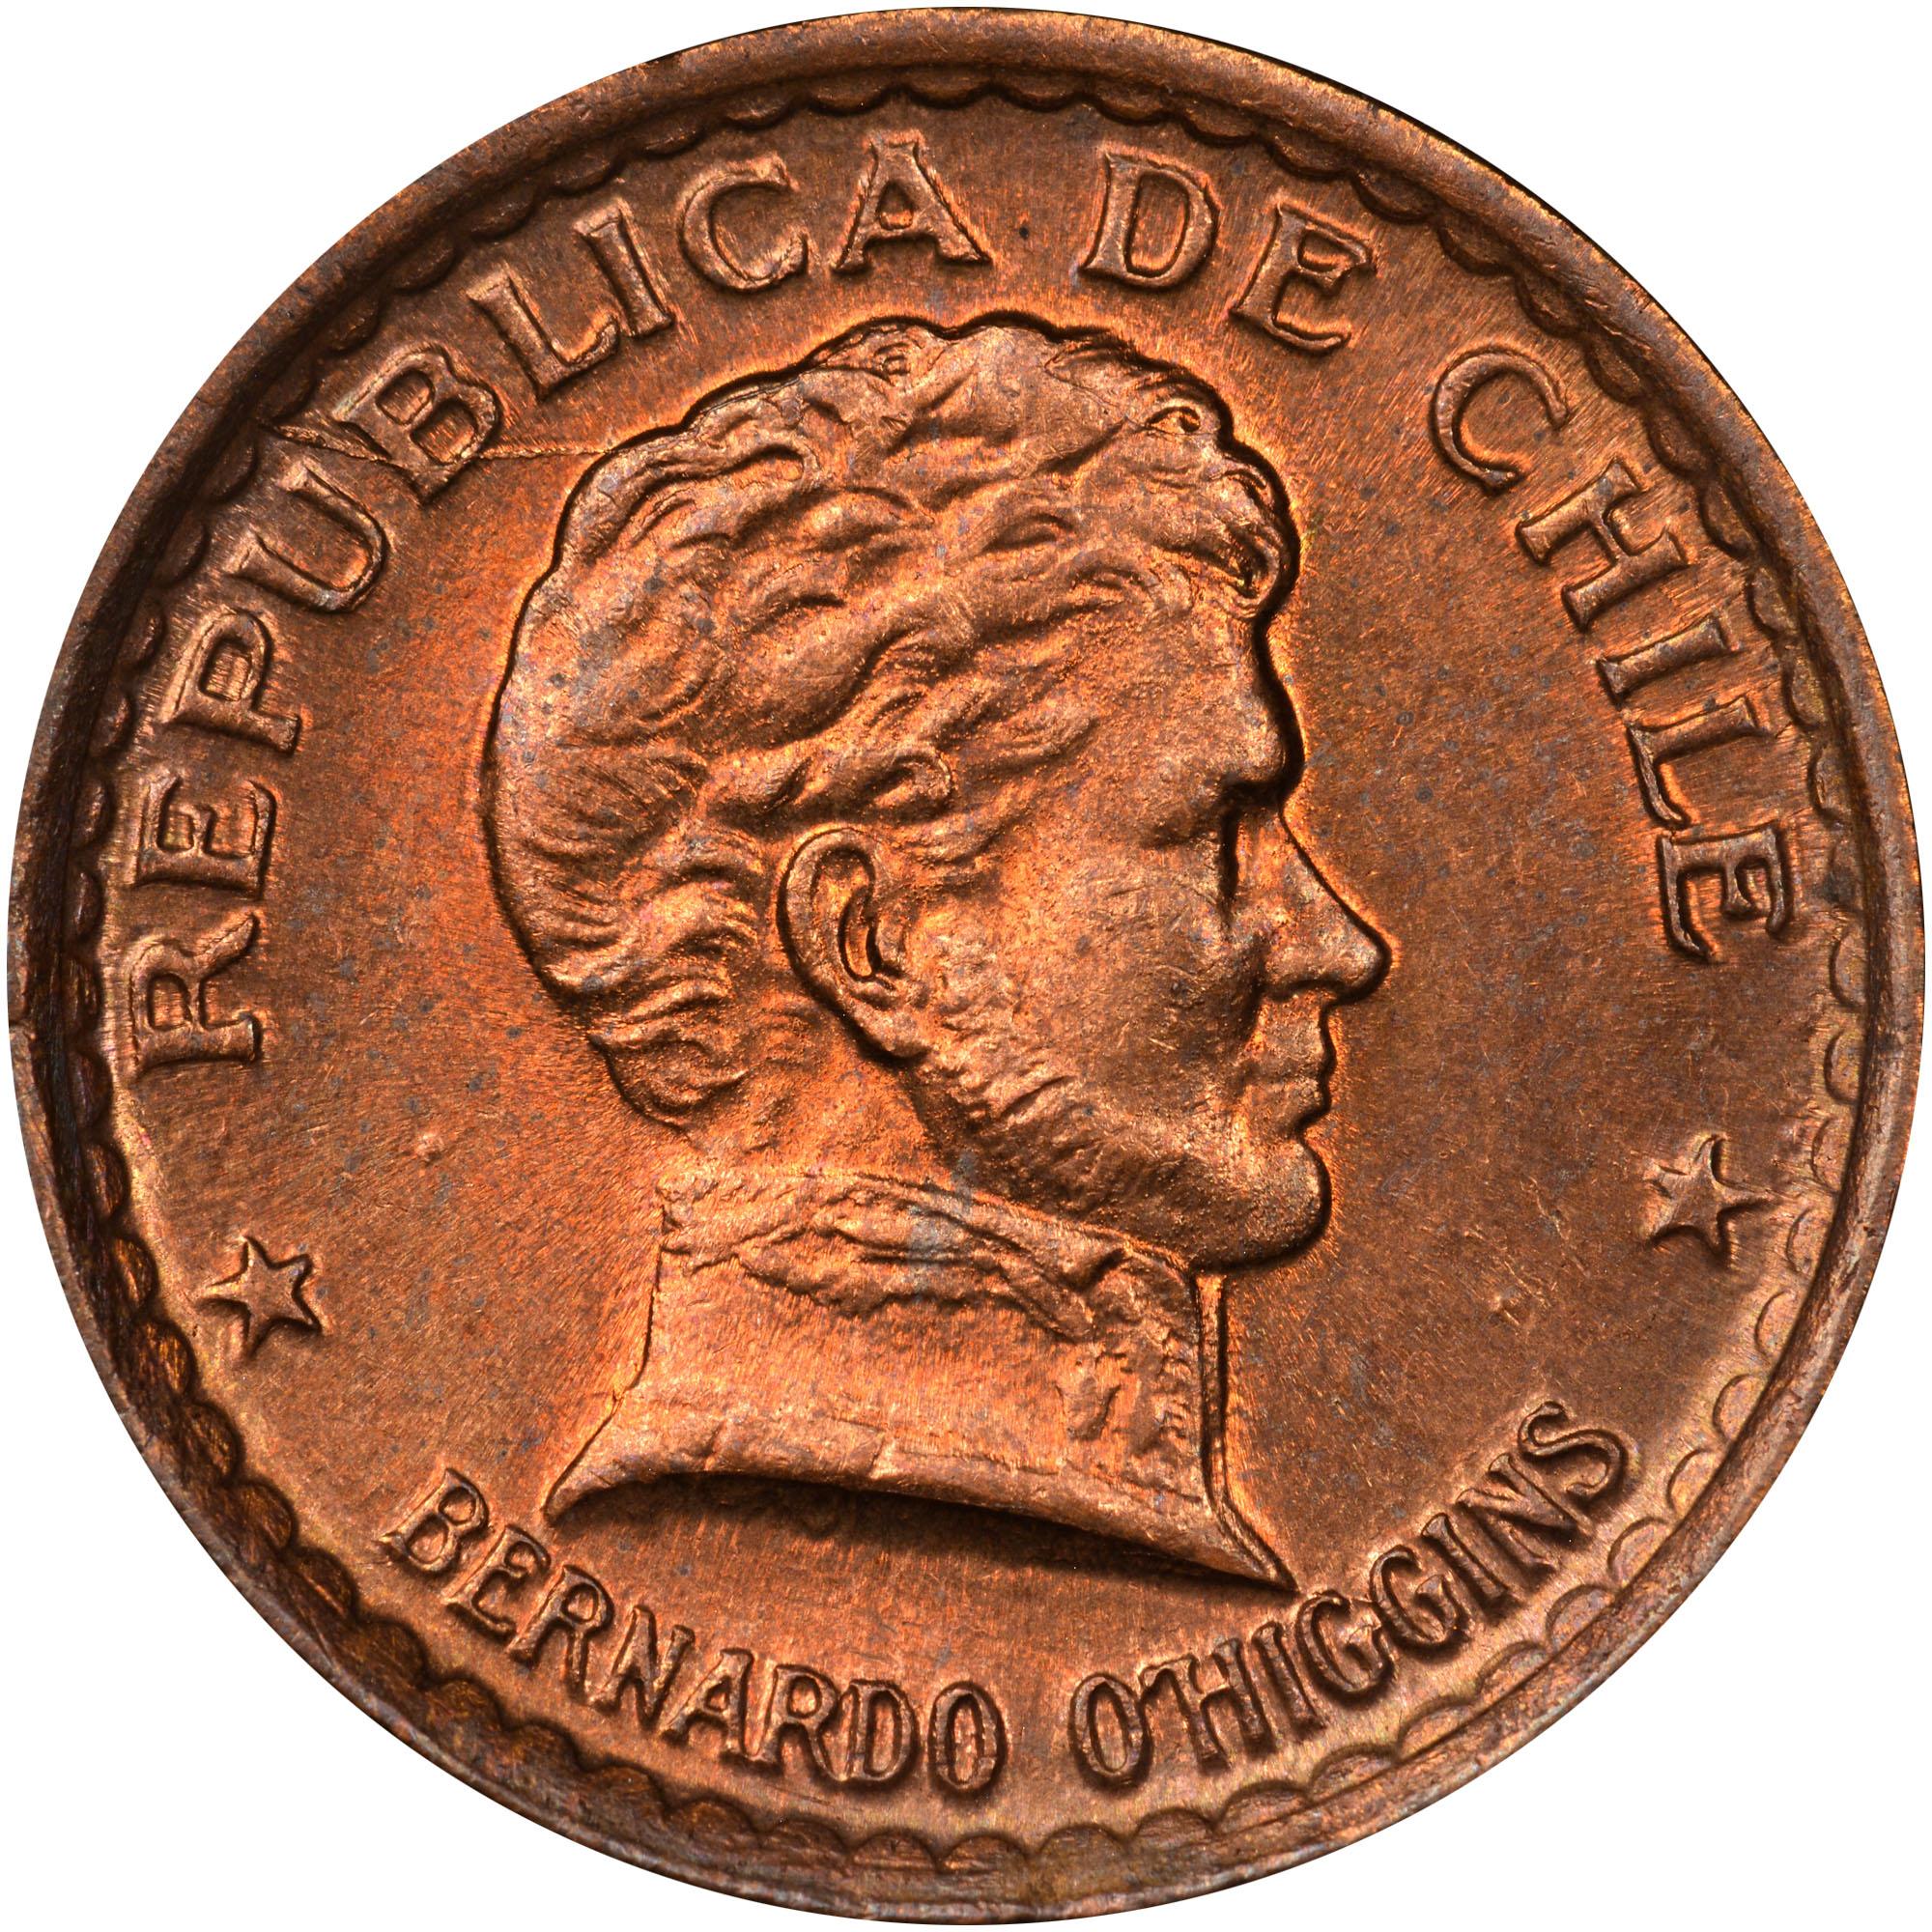 Chile 20 Centavos obverse